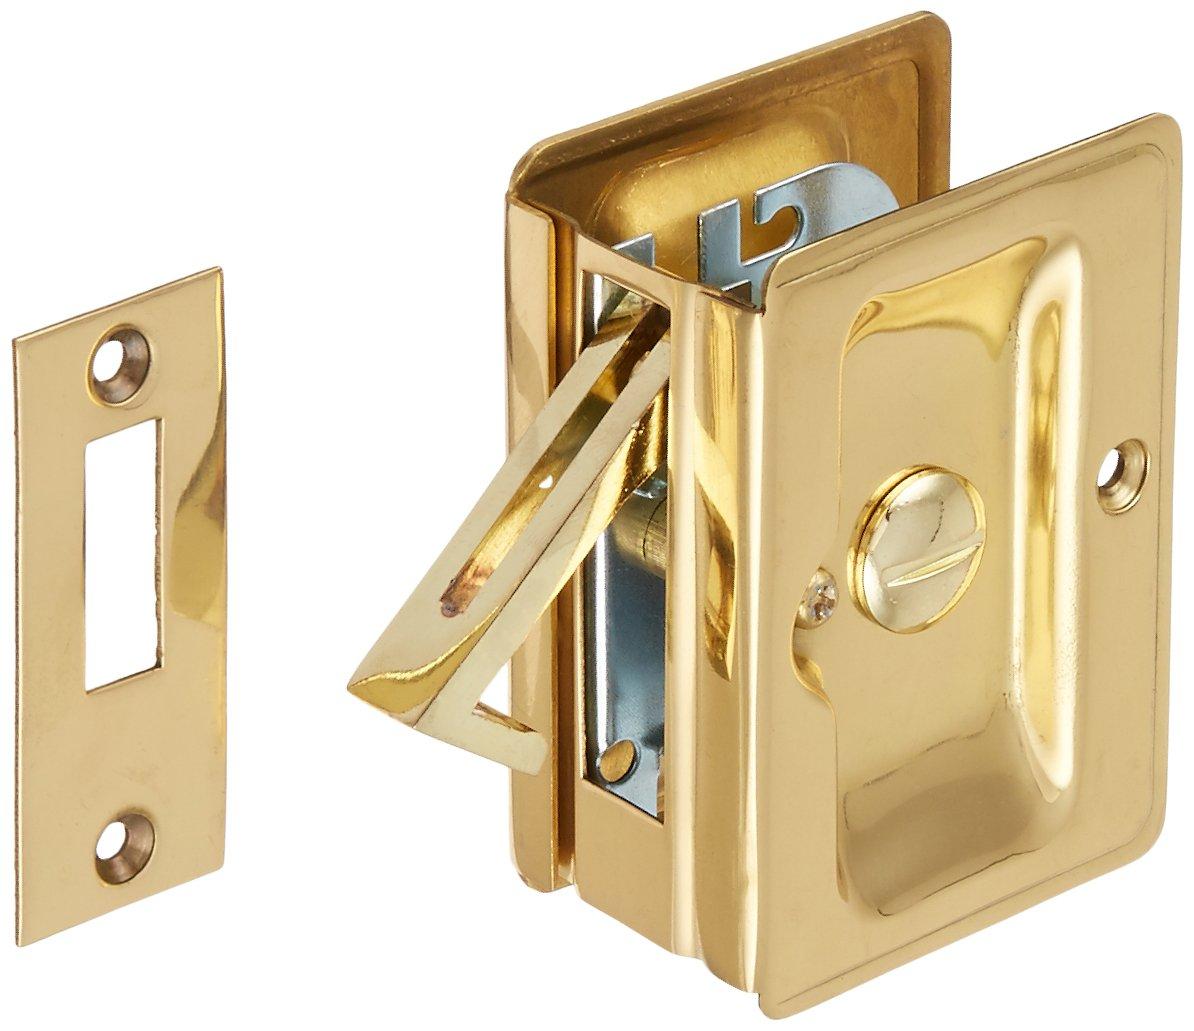 Deltana SDLA325U3 Adjustable 3 1/4-Inch x 2 1/4-Inch Privacy HD Pocket Locks